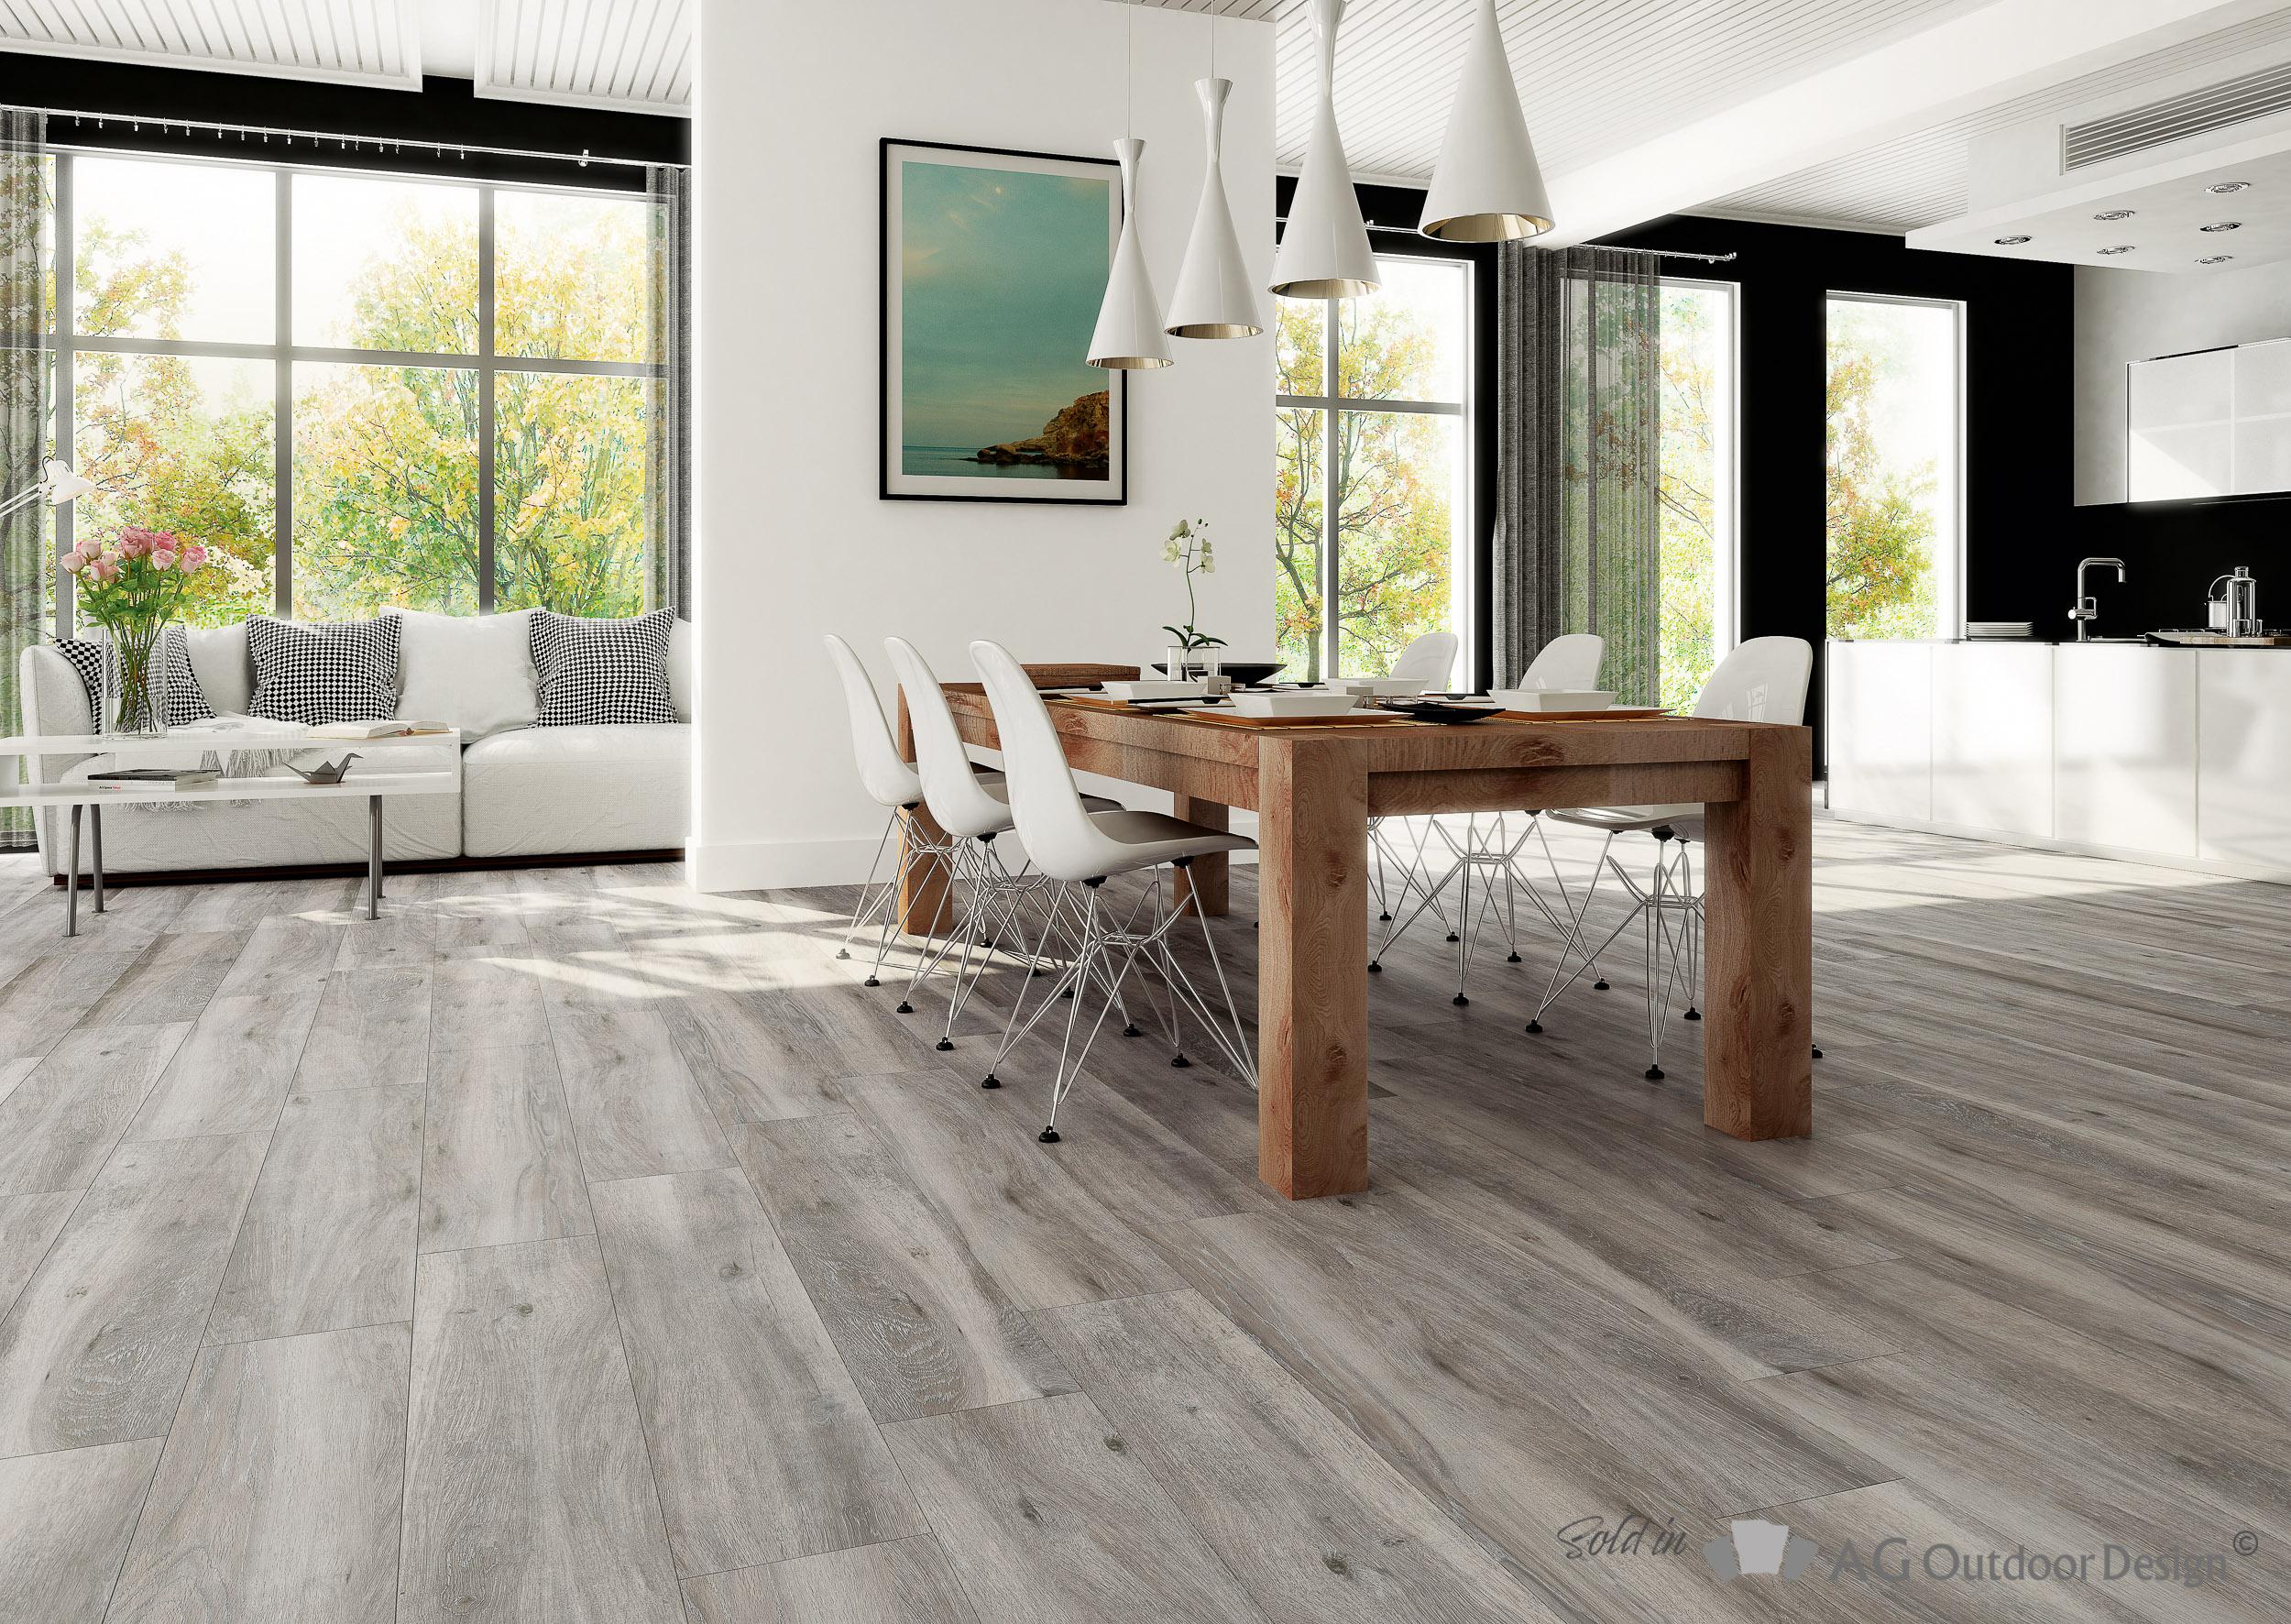 AG Indoor Design